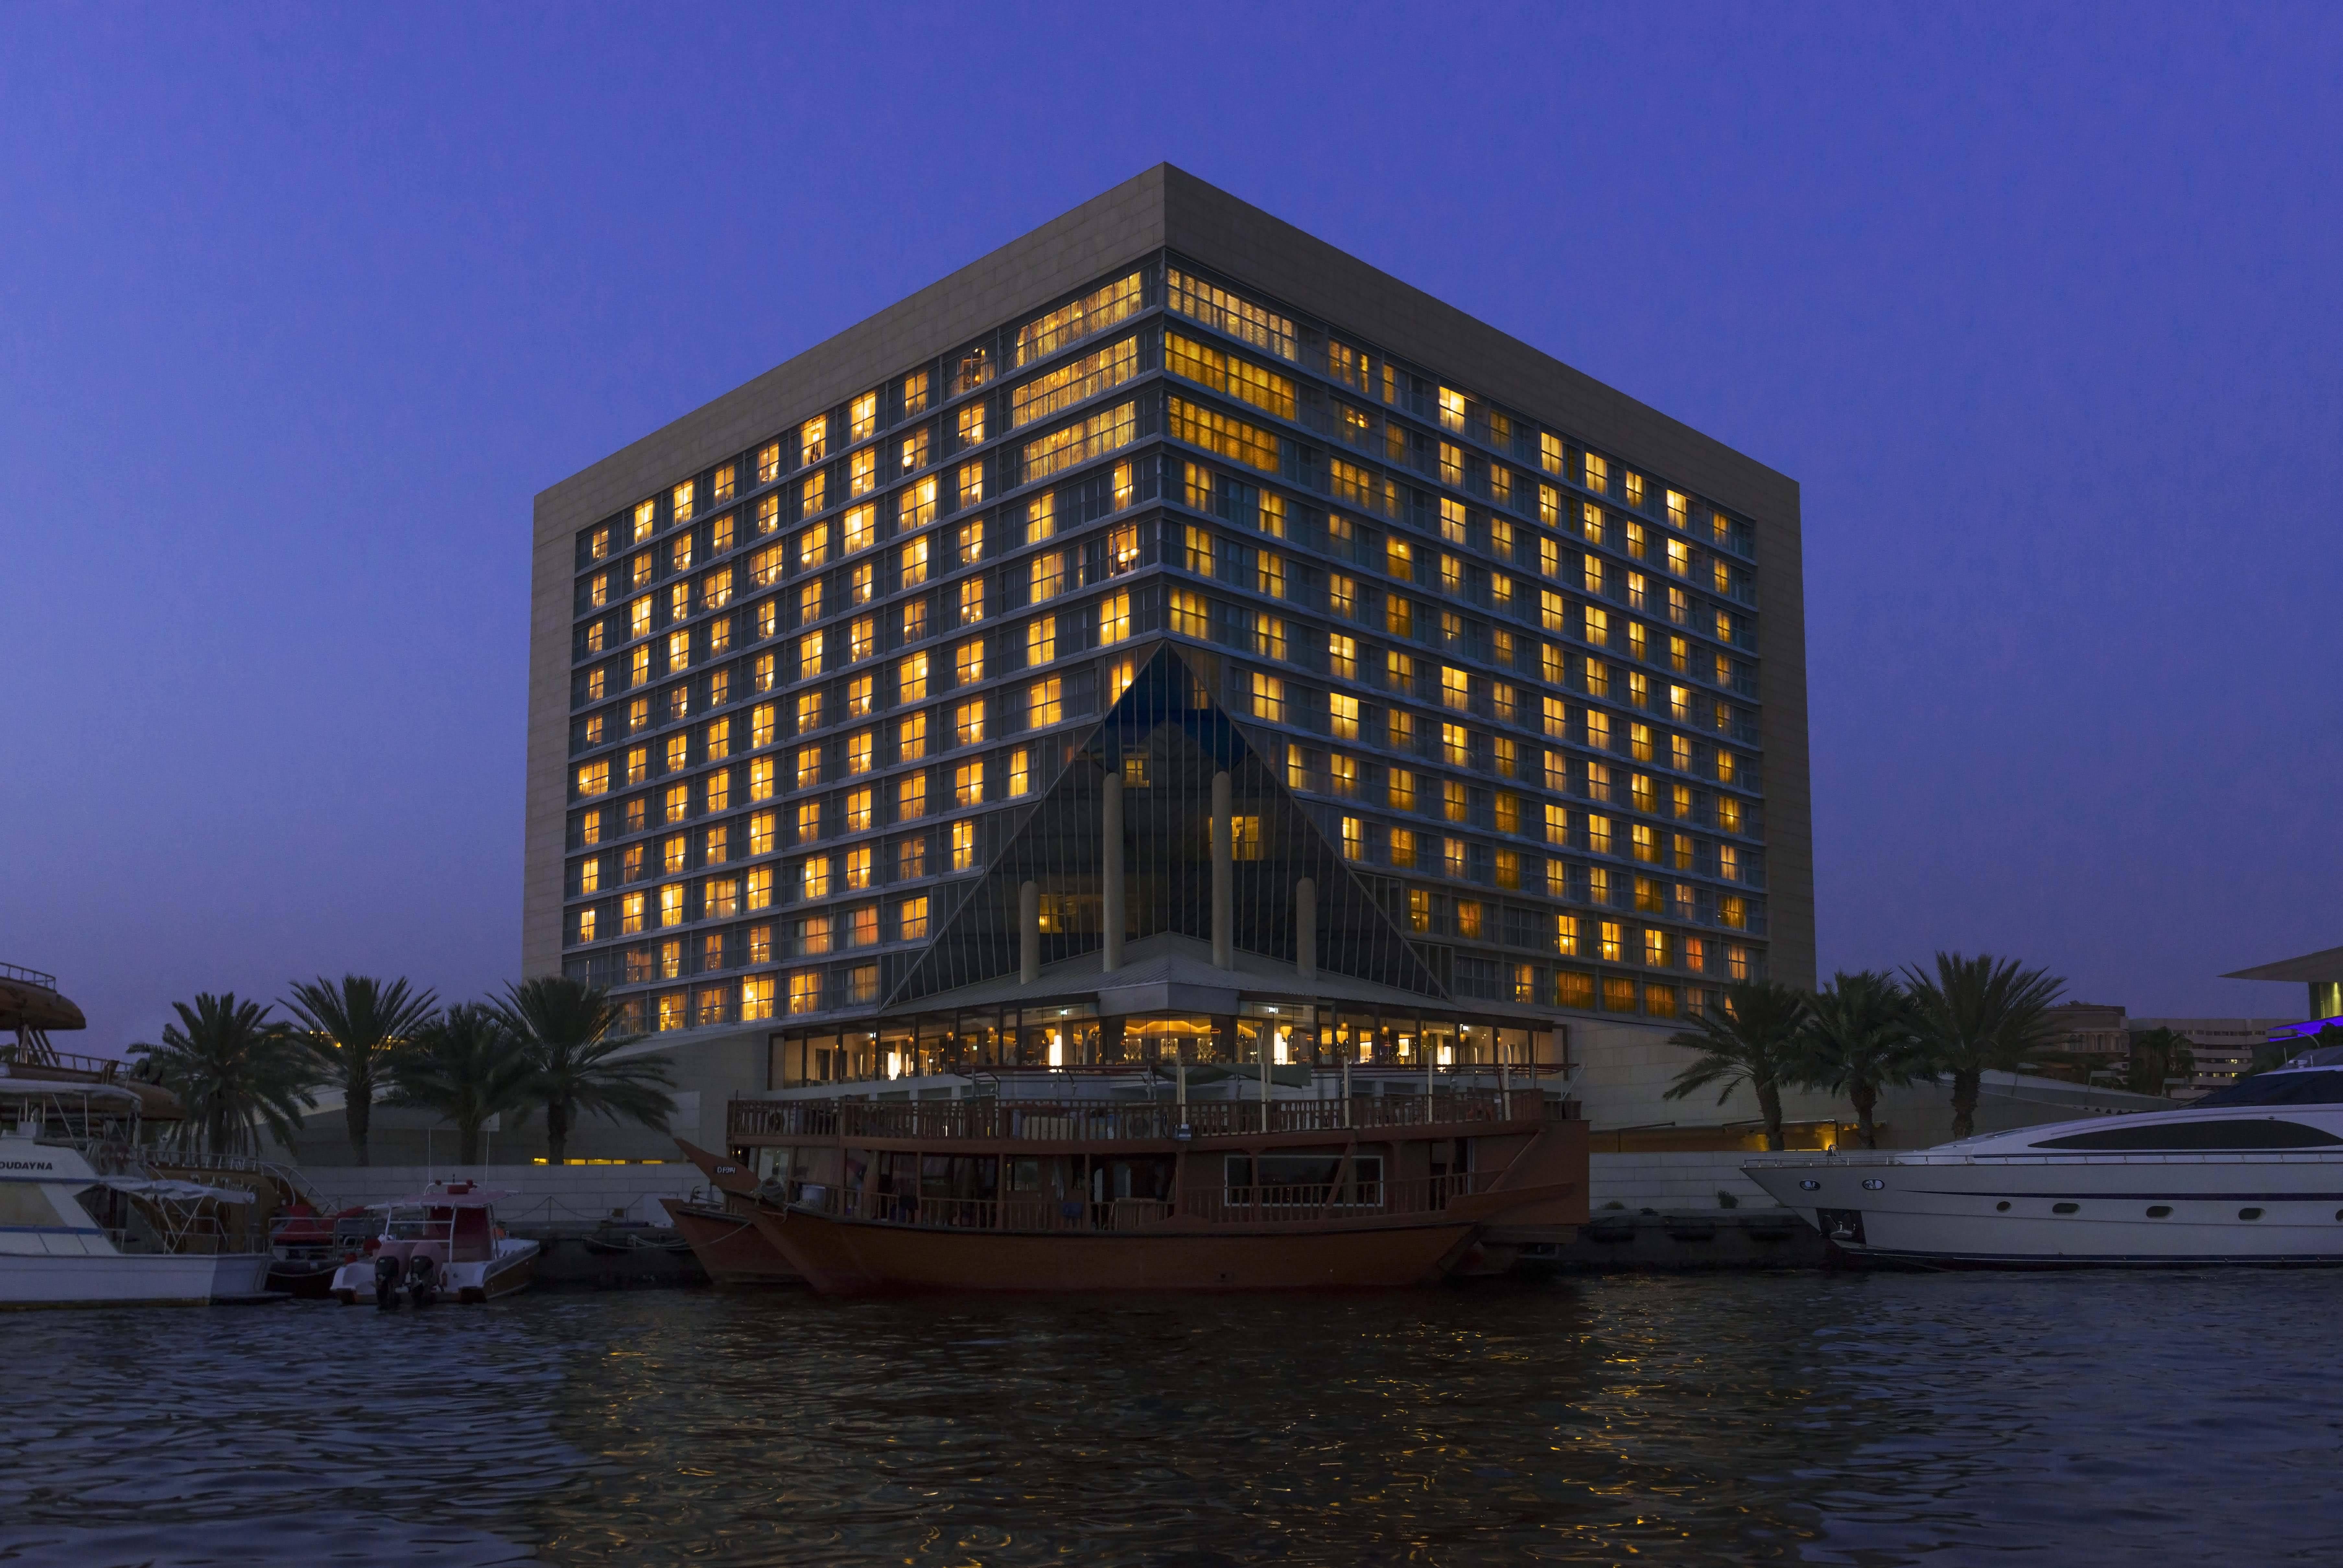 عروض فندق وأبراج شيراتون خور دبي لشهر رمضان 2016